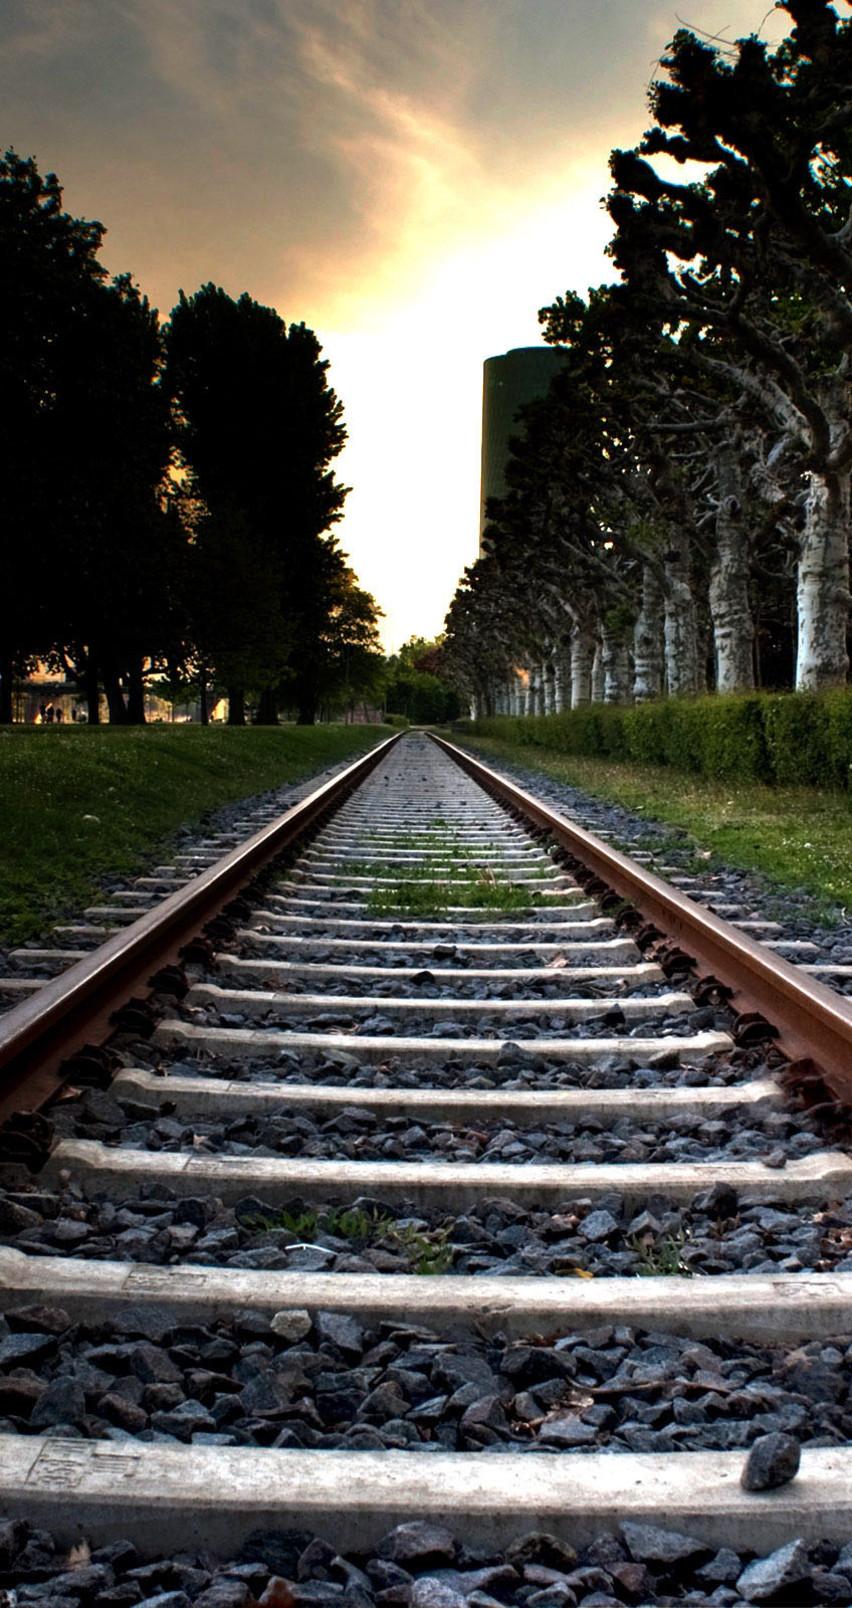 4k railroad wallpapers high quality download free - Wallpaper pc 4k ...